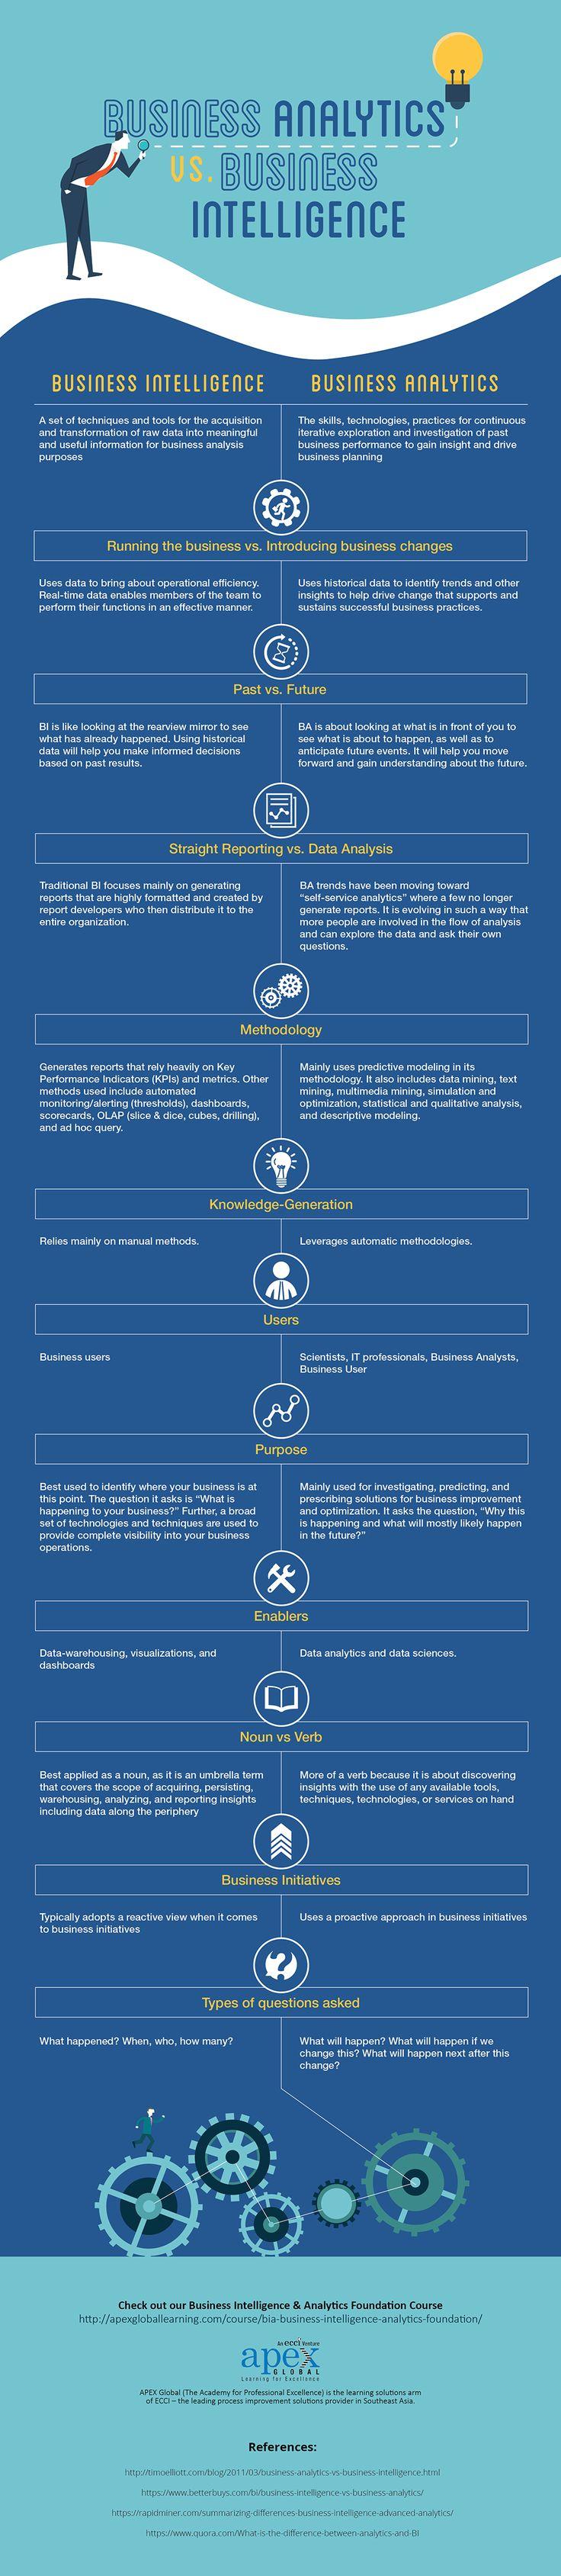 Business Analytics vs. Business Intelligence (Infographic)